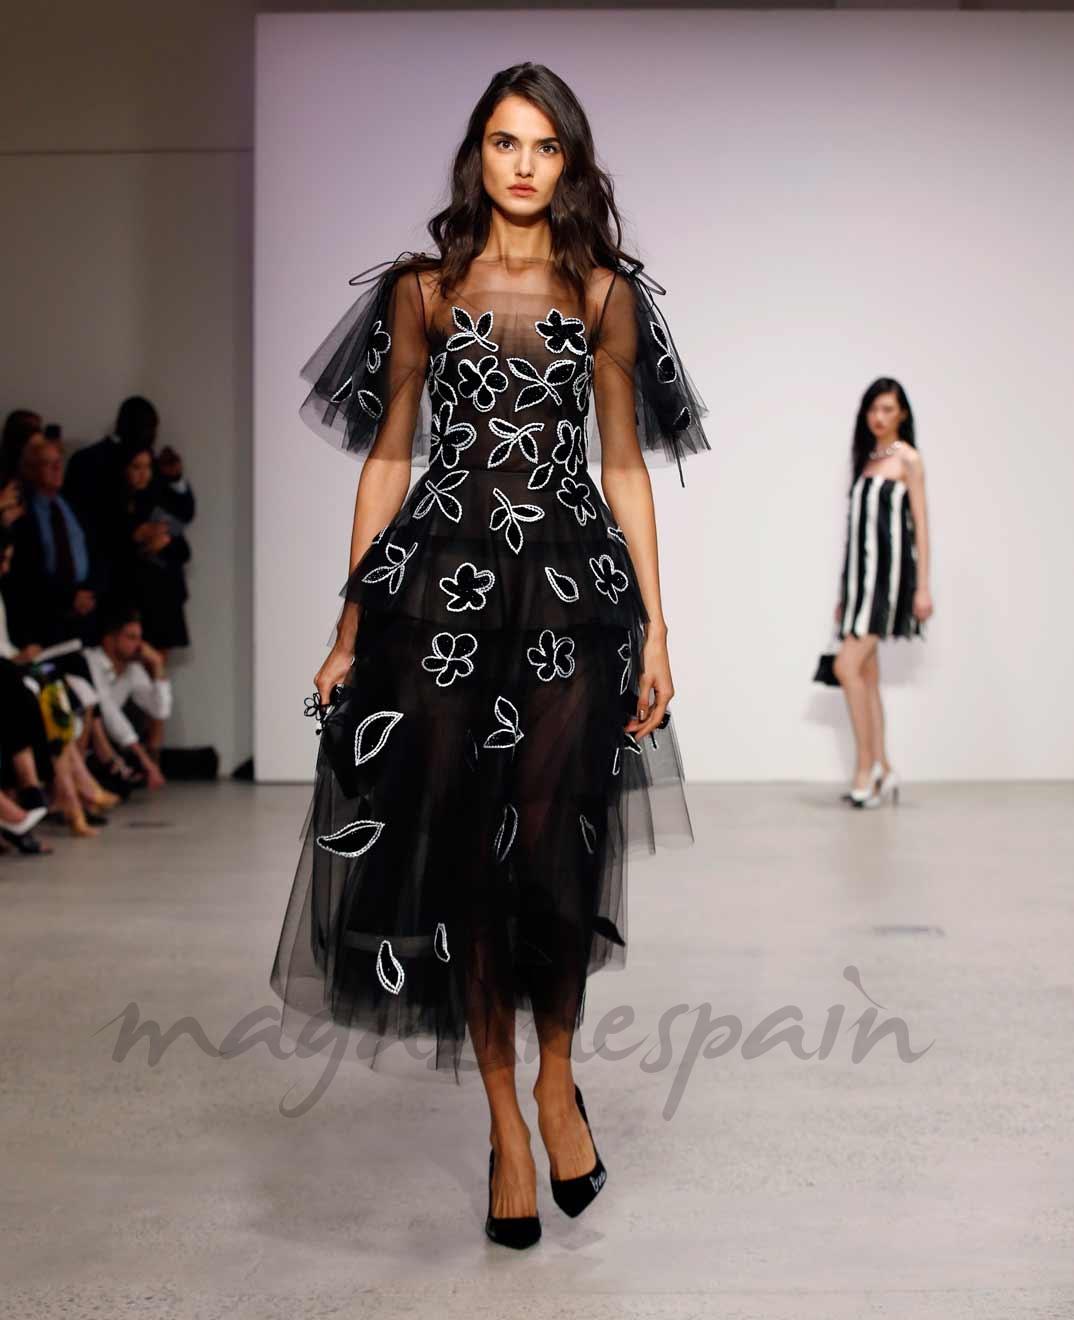 New York Fashion Week - SS18 - Oscar de la Renta